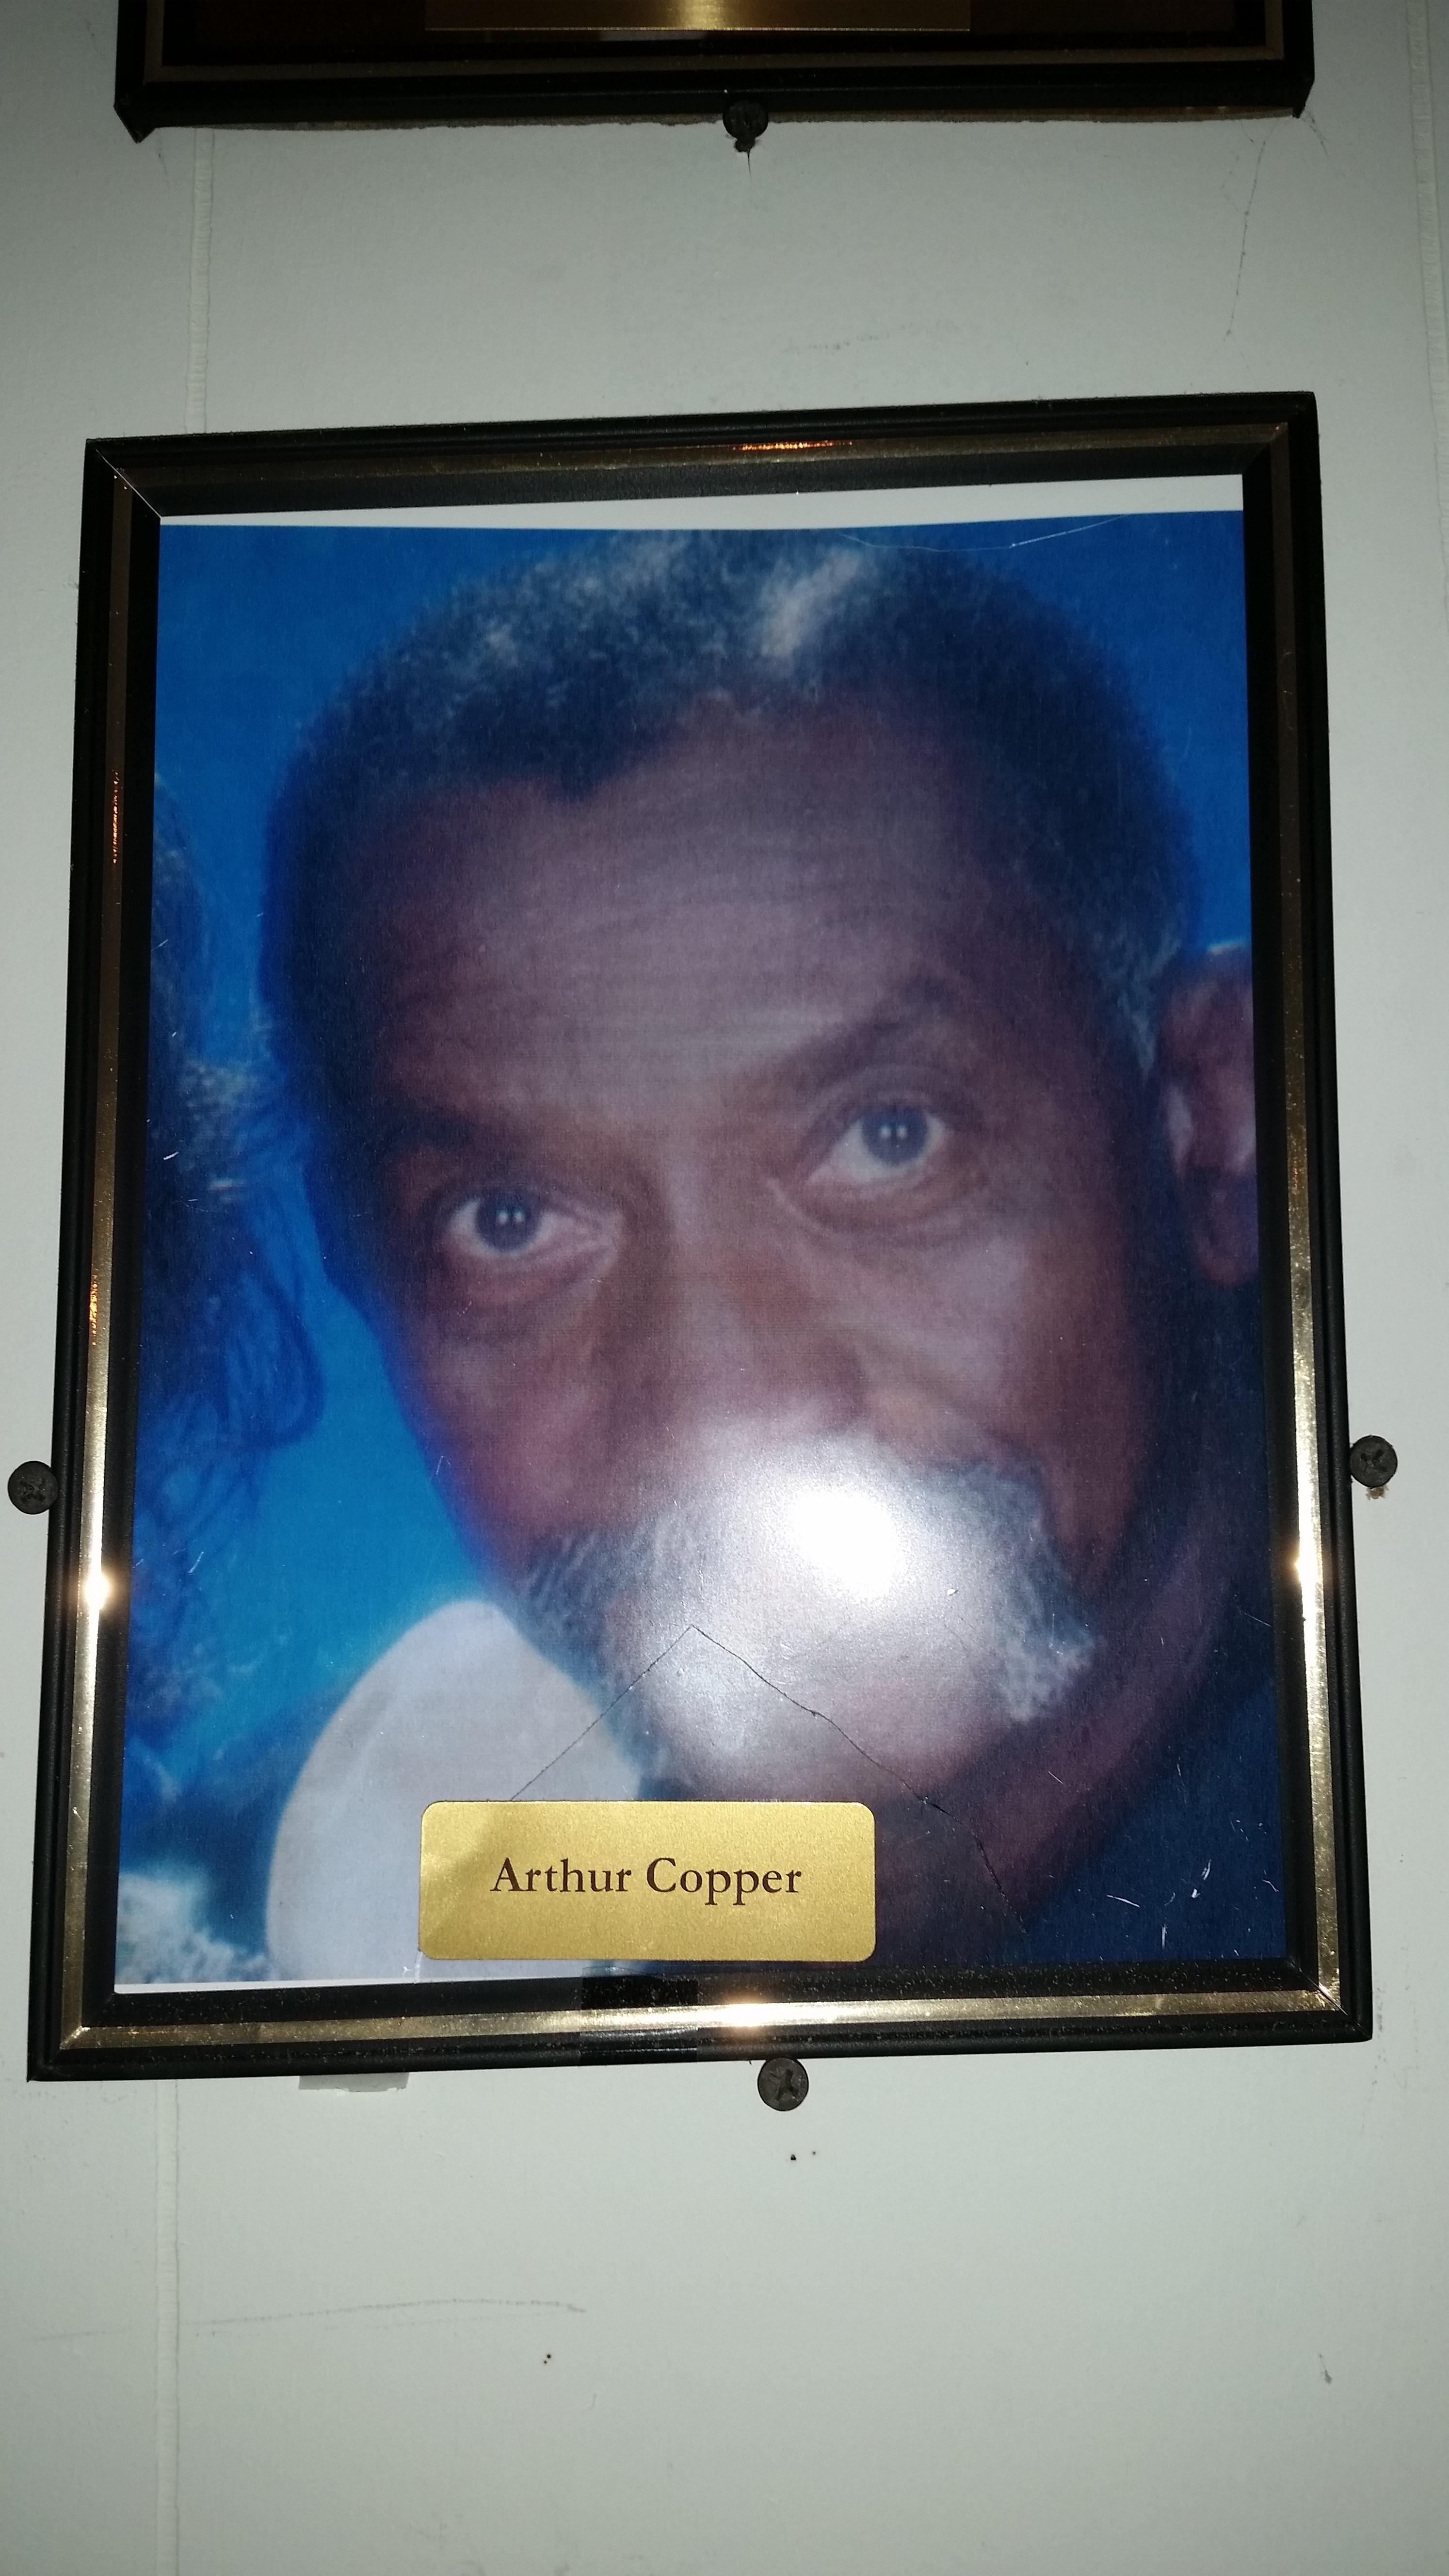 Mr. Arthur Cooper